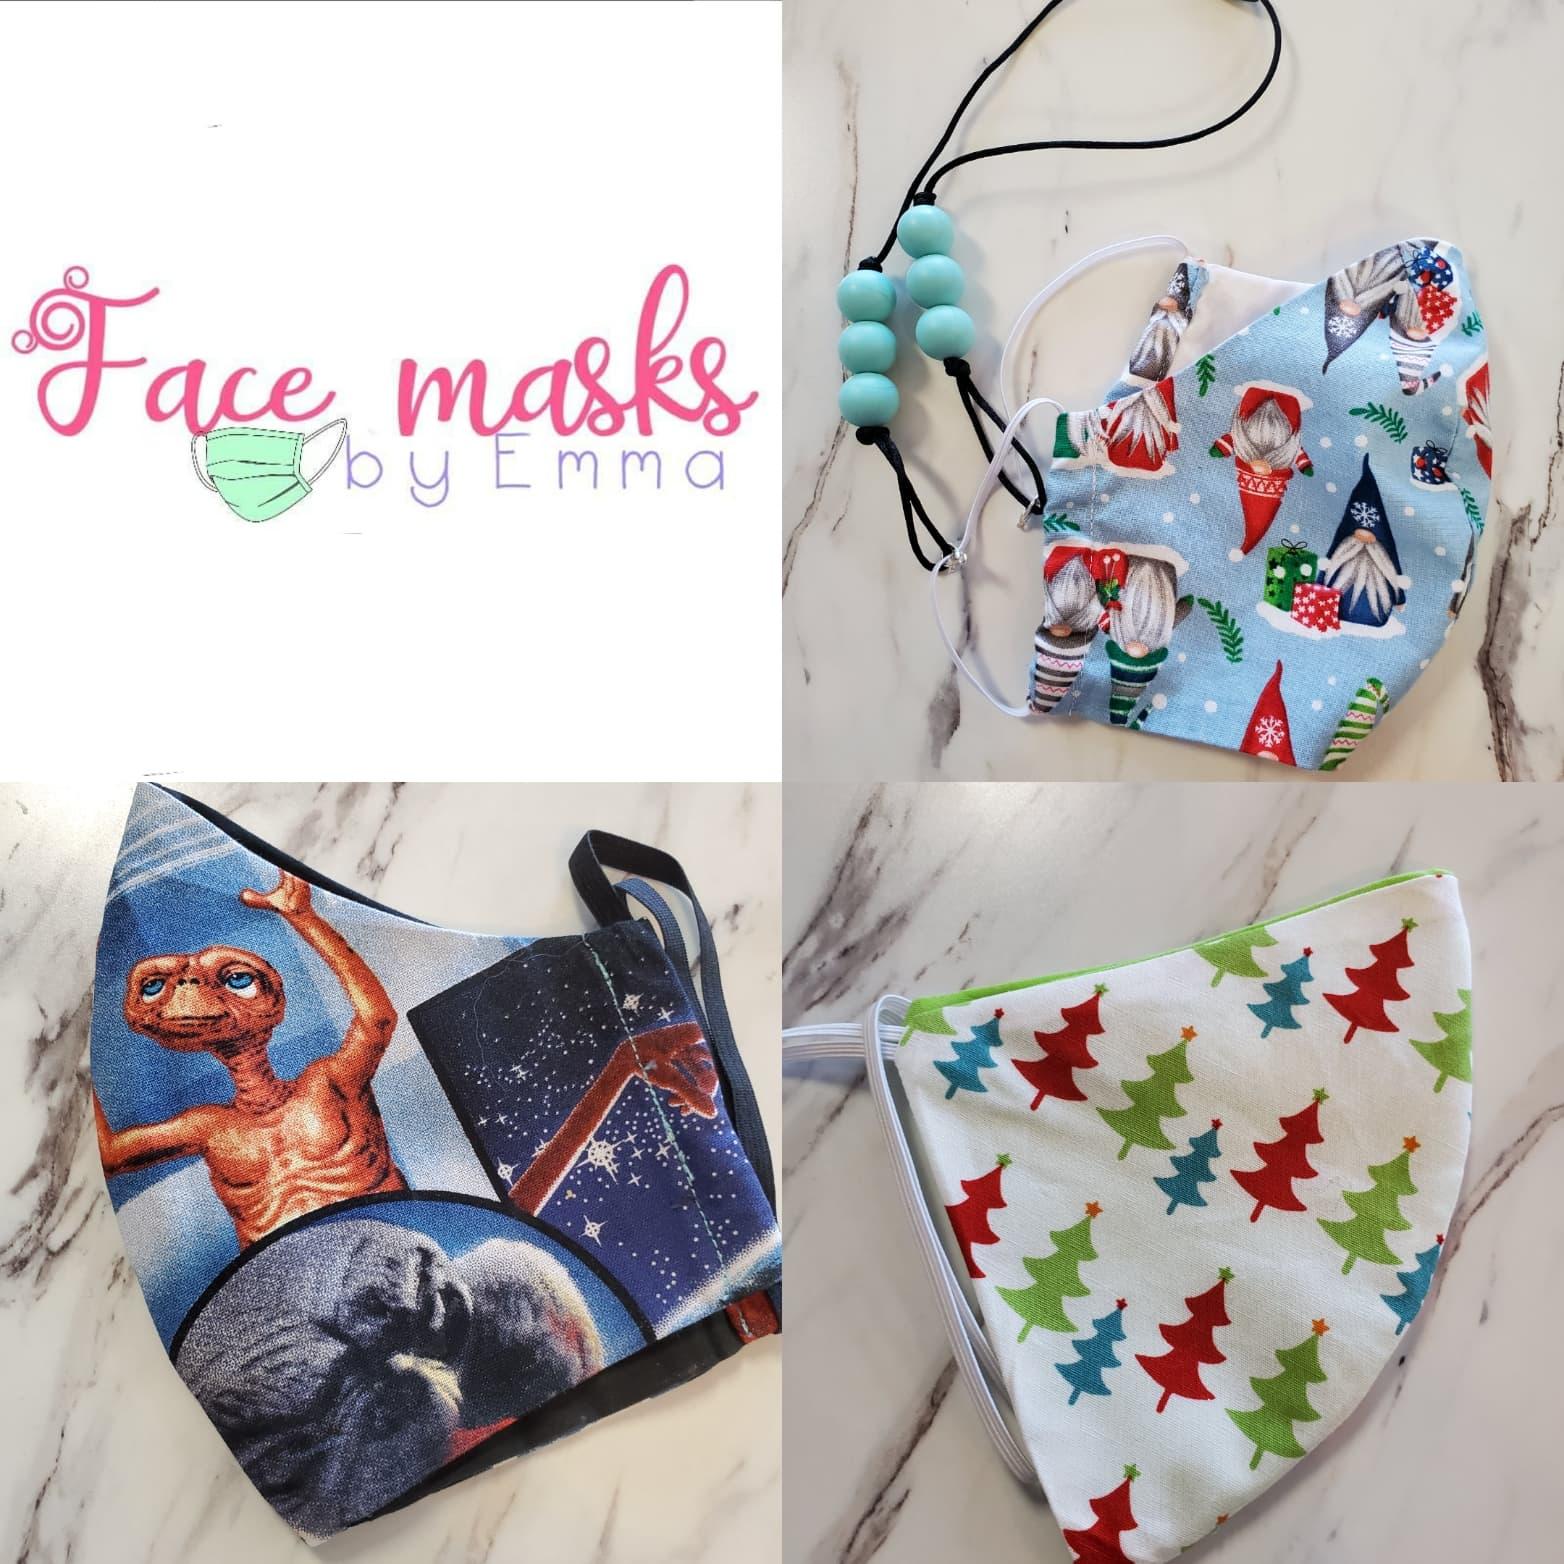 Face Masks by Emma